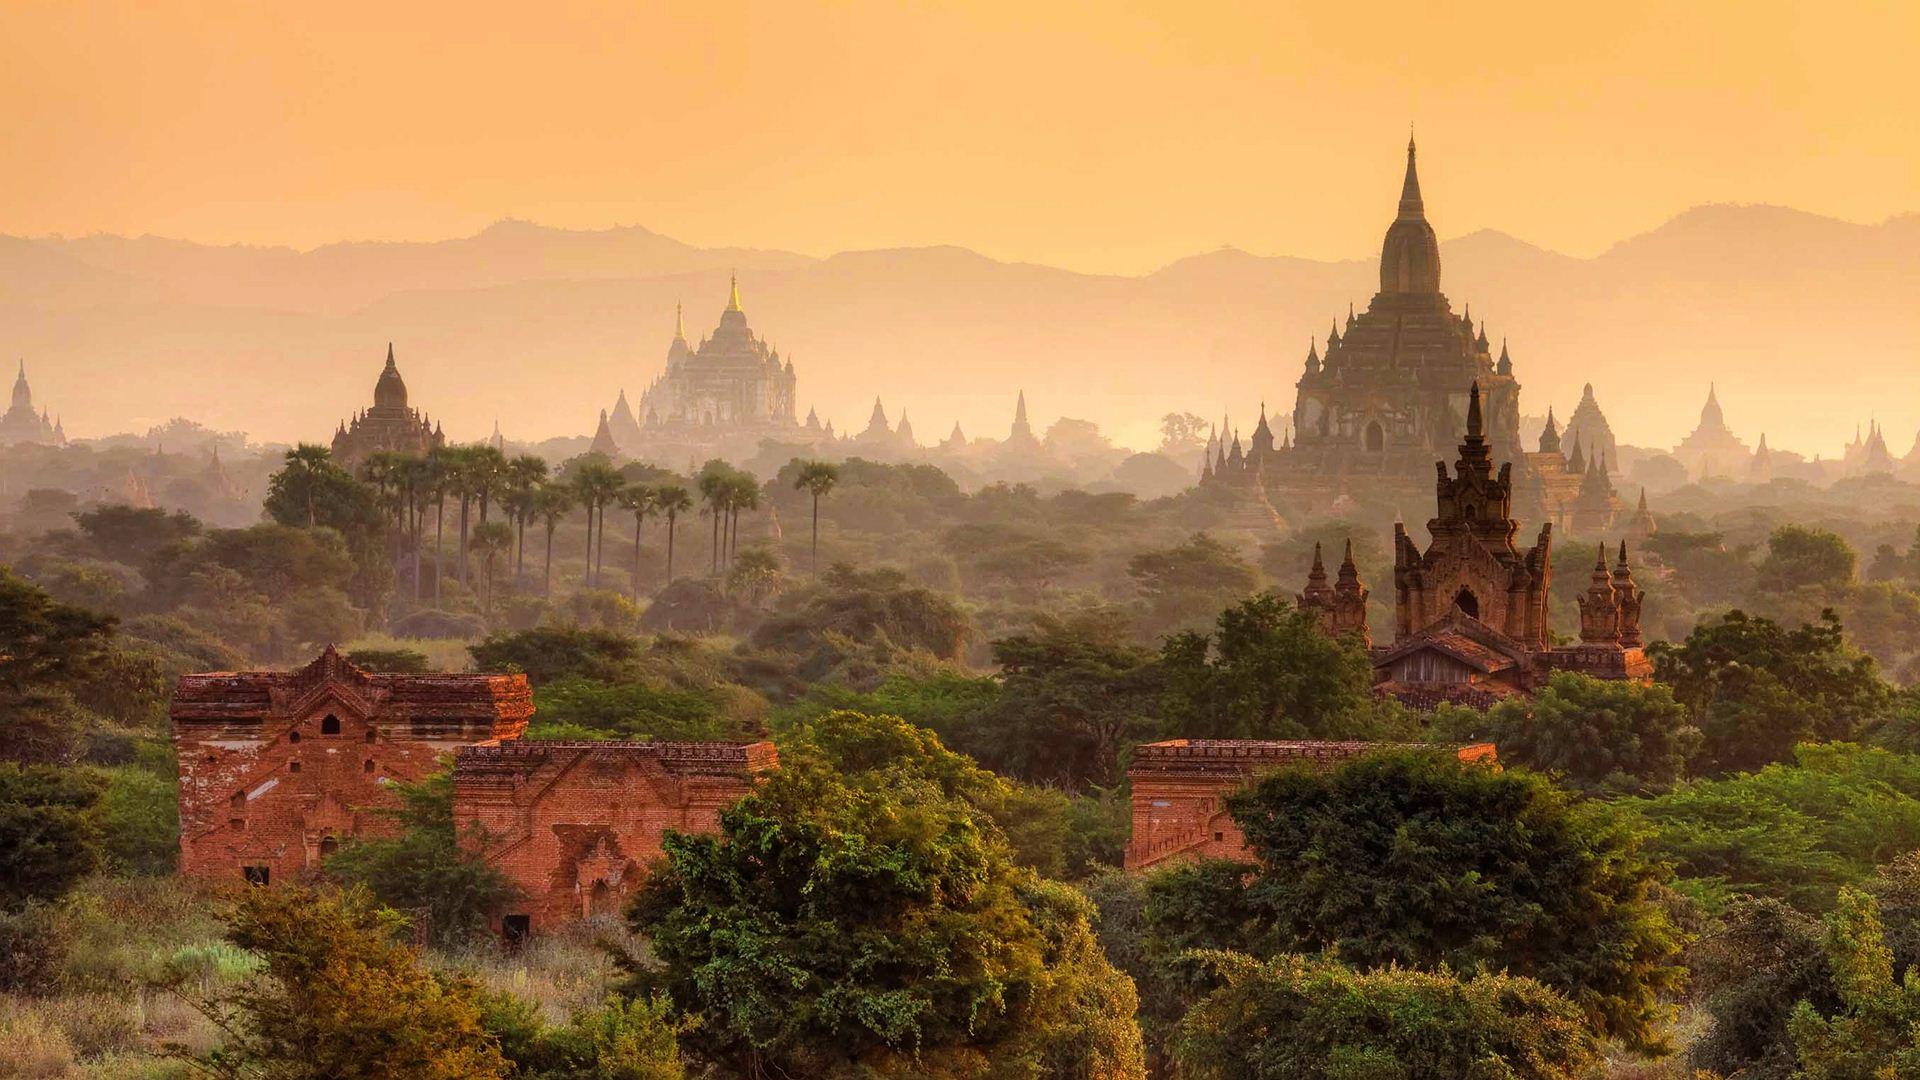 Cars Iphone 7 Wallpaper Bagan Myanmar Wallpapers High Quality Download Free